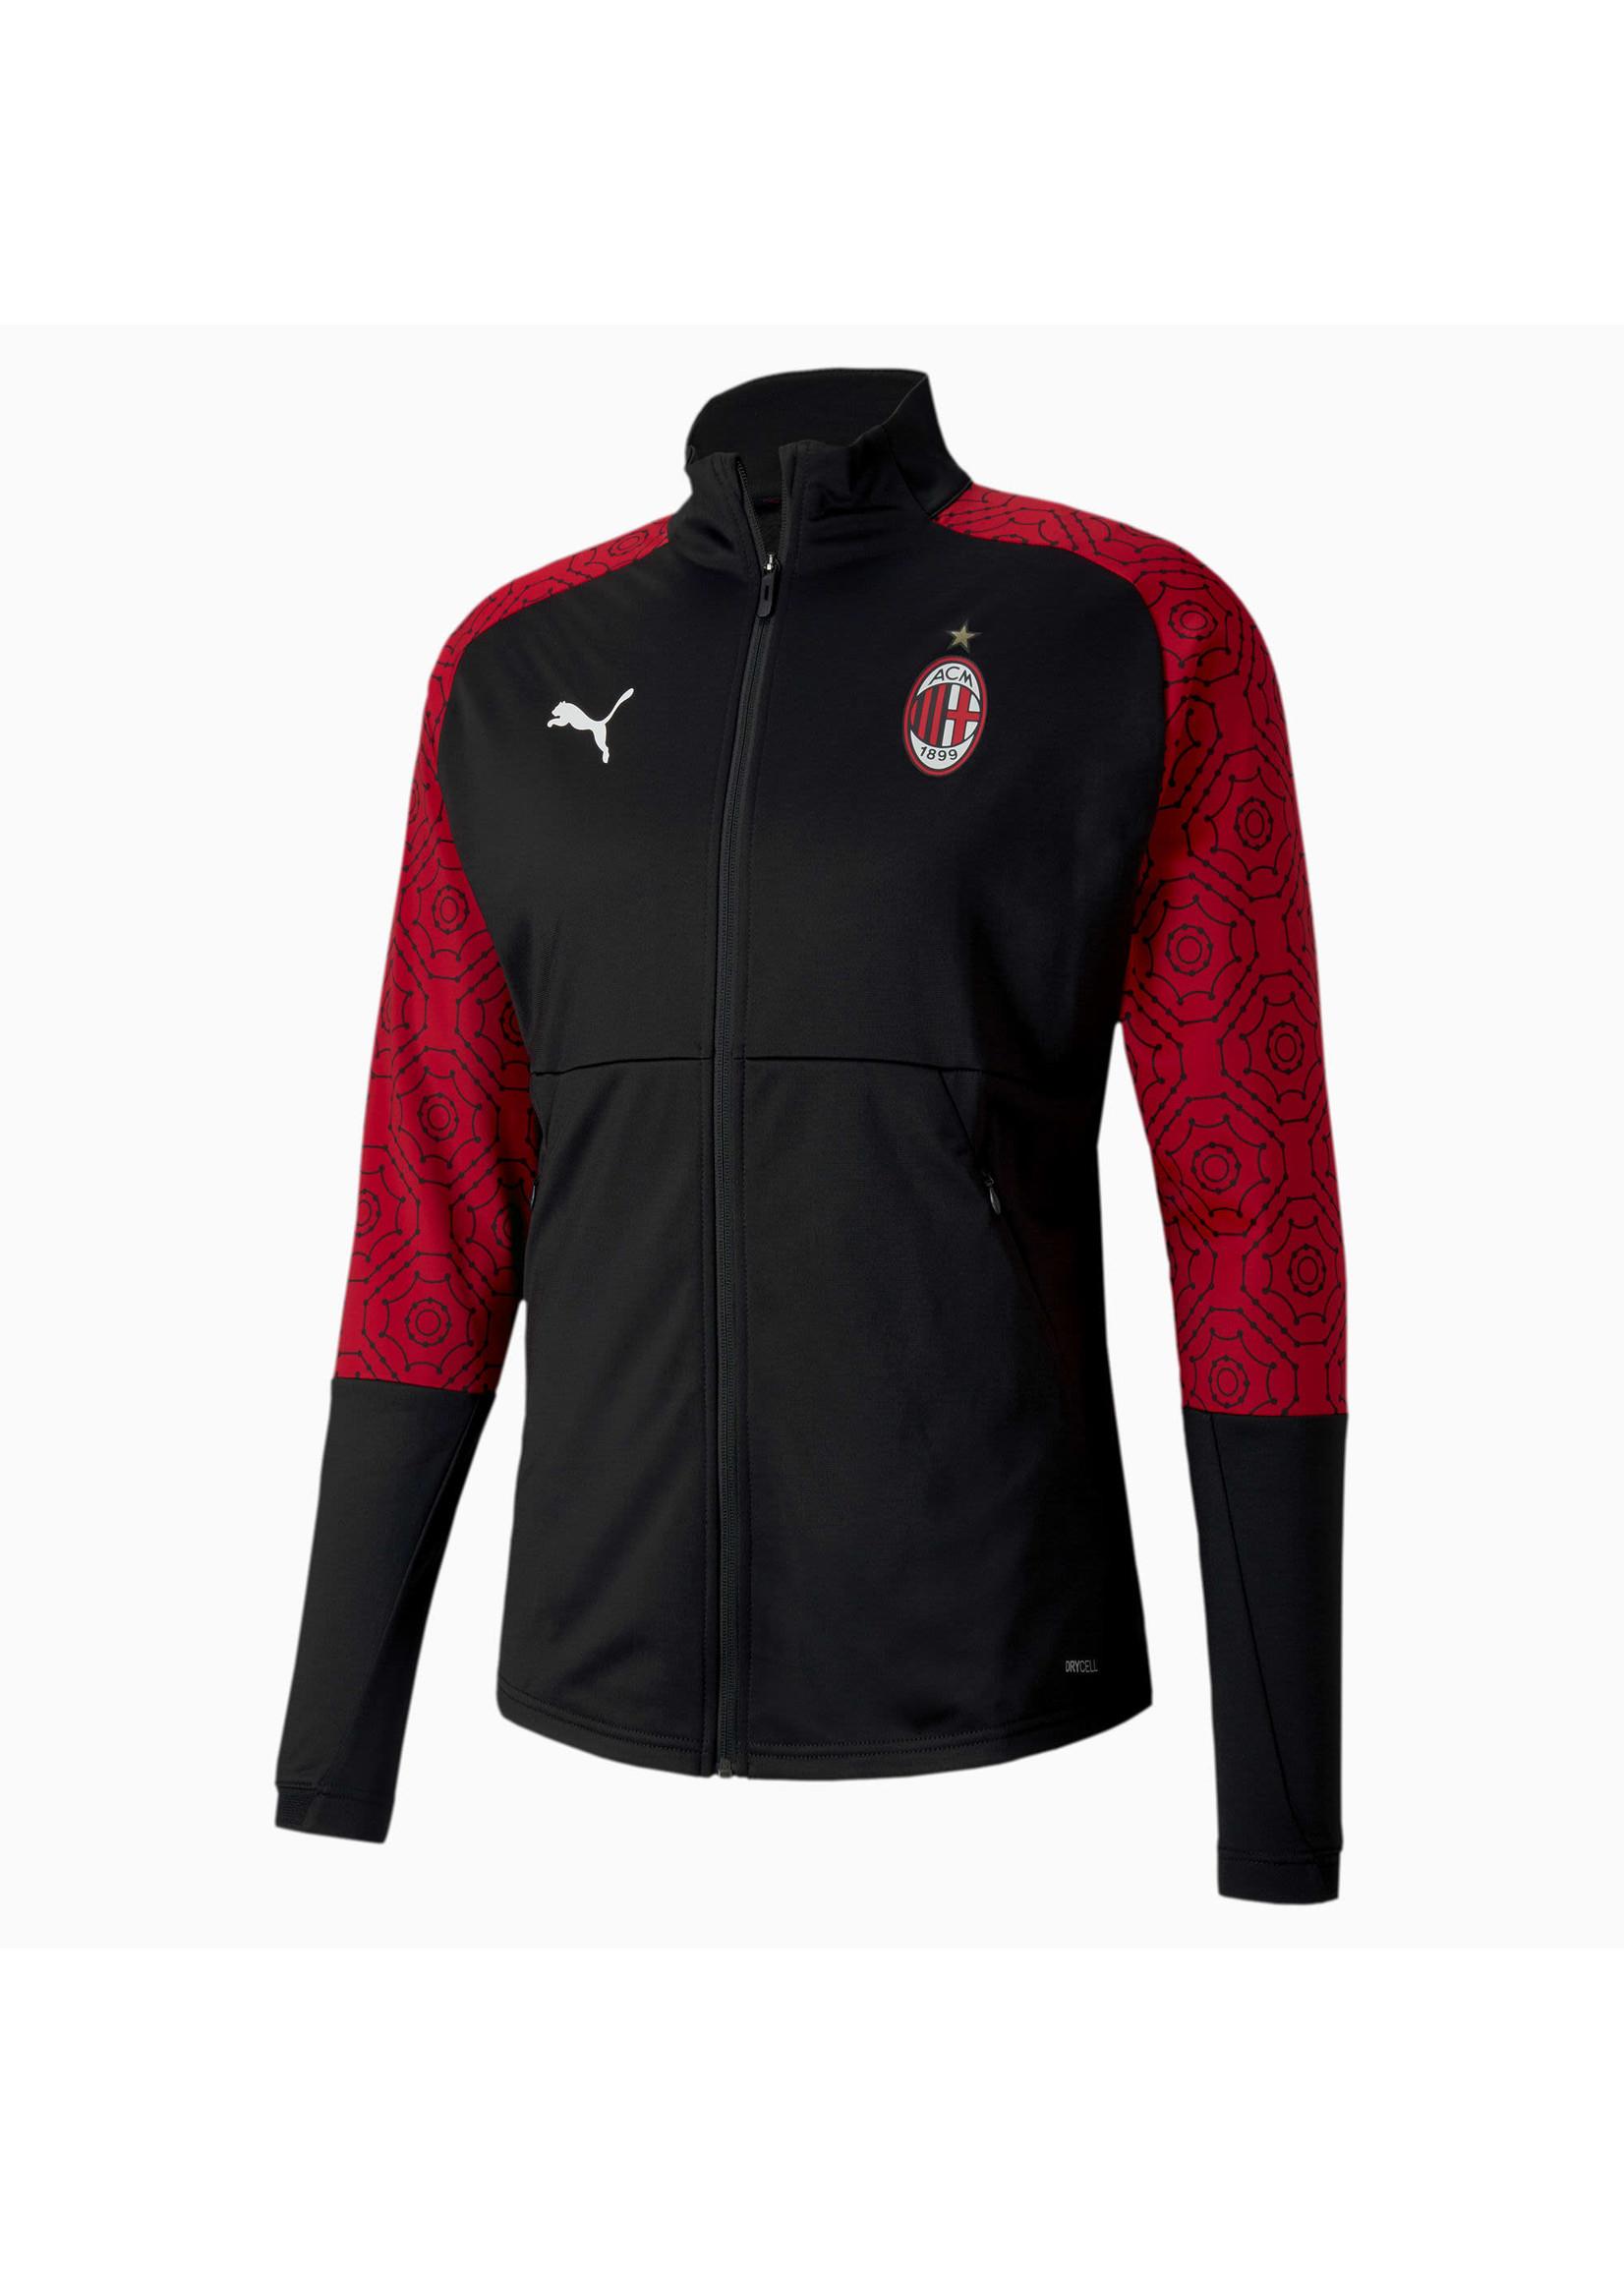 Puma AC Milan Stadium Track Jacket - 20/21 Home